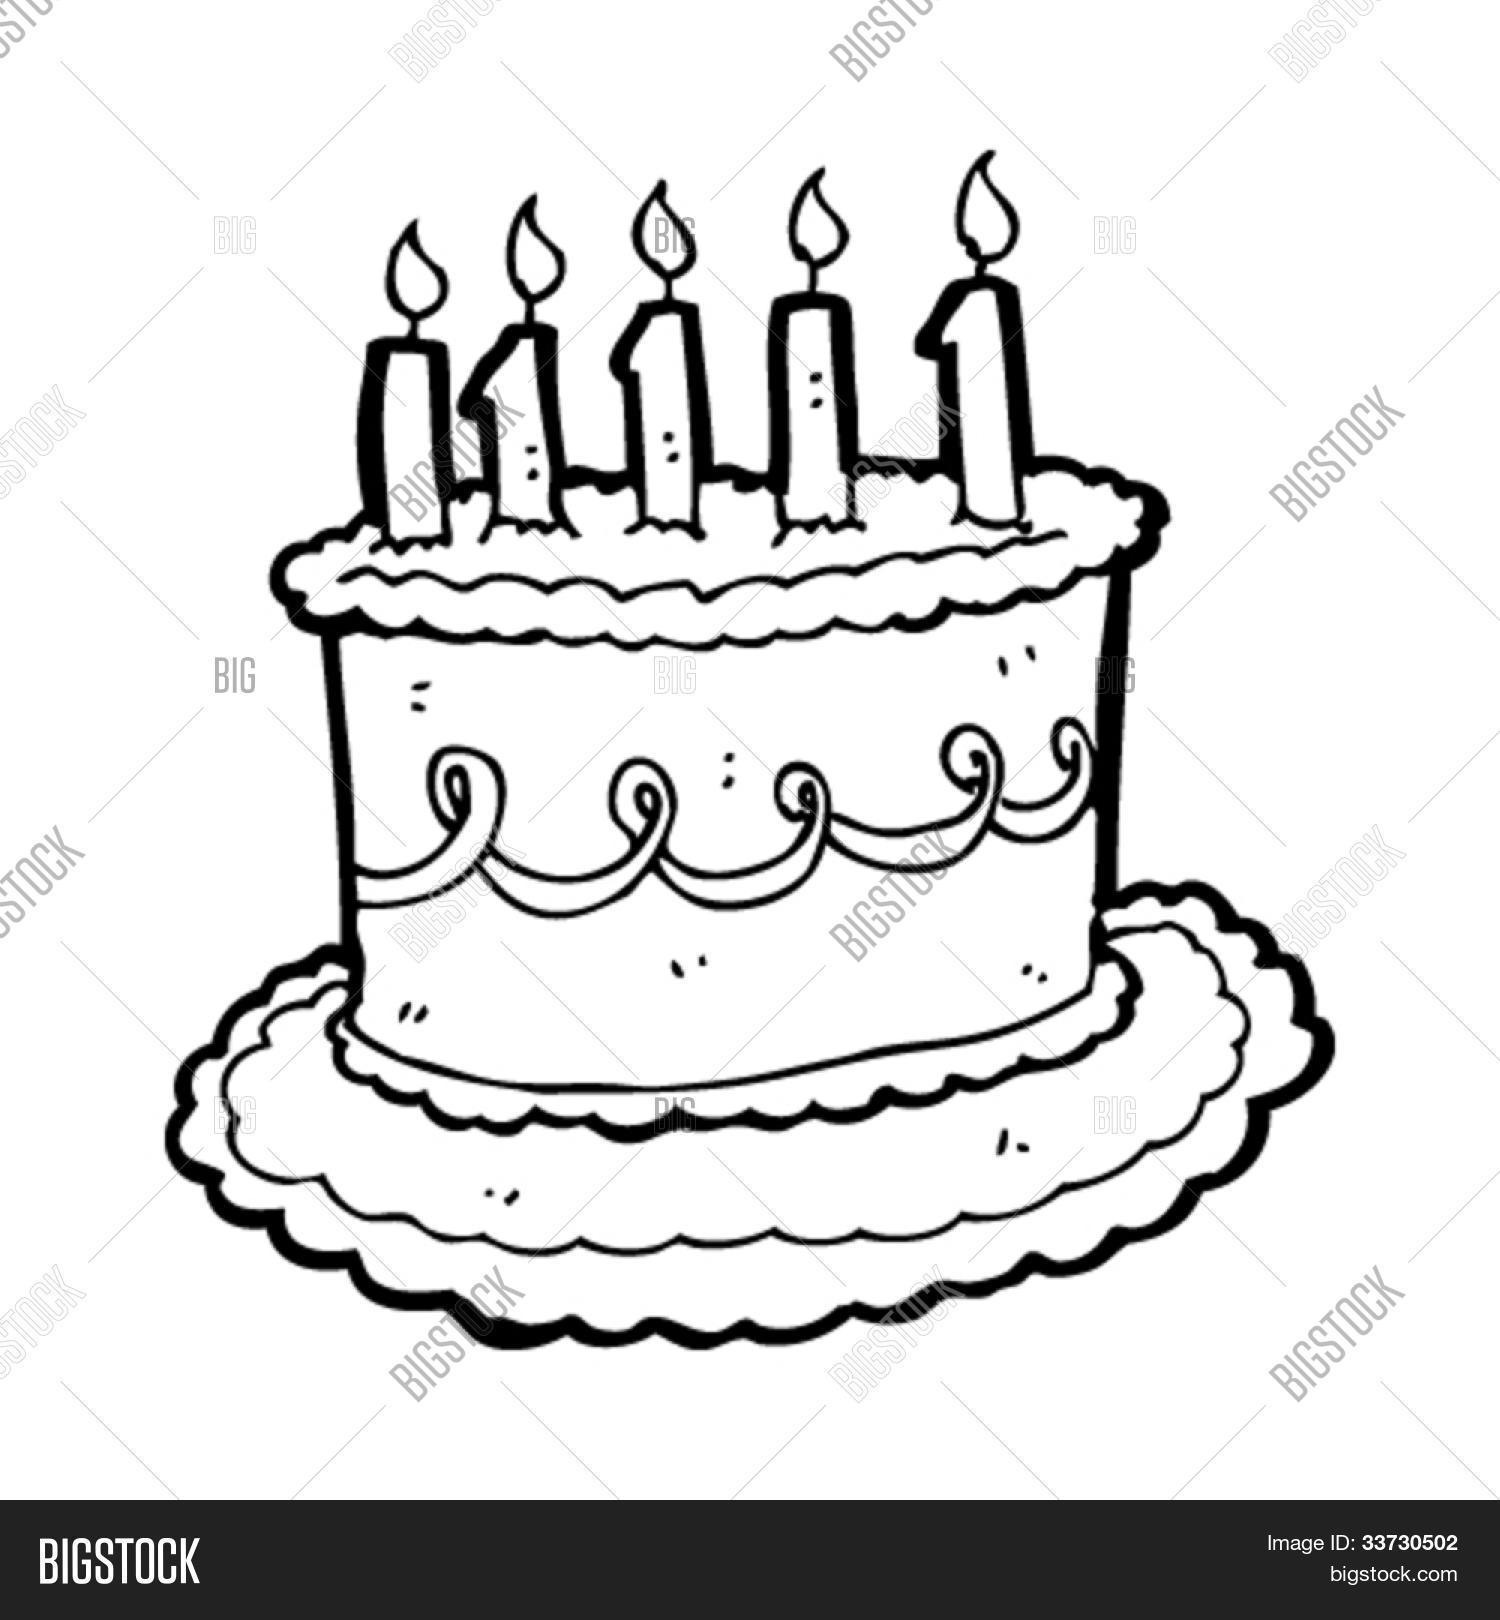 1500x1620 Cartoon Birthday Cake Vector Amp Photo Bigstock